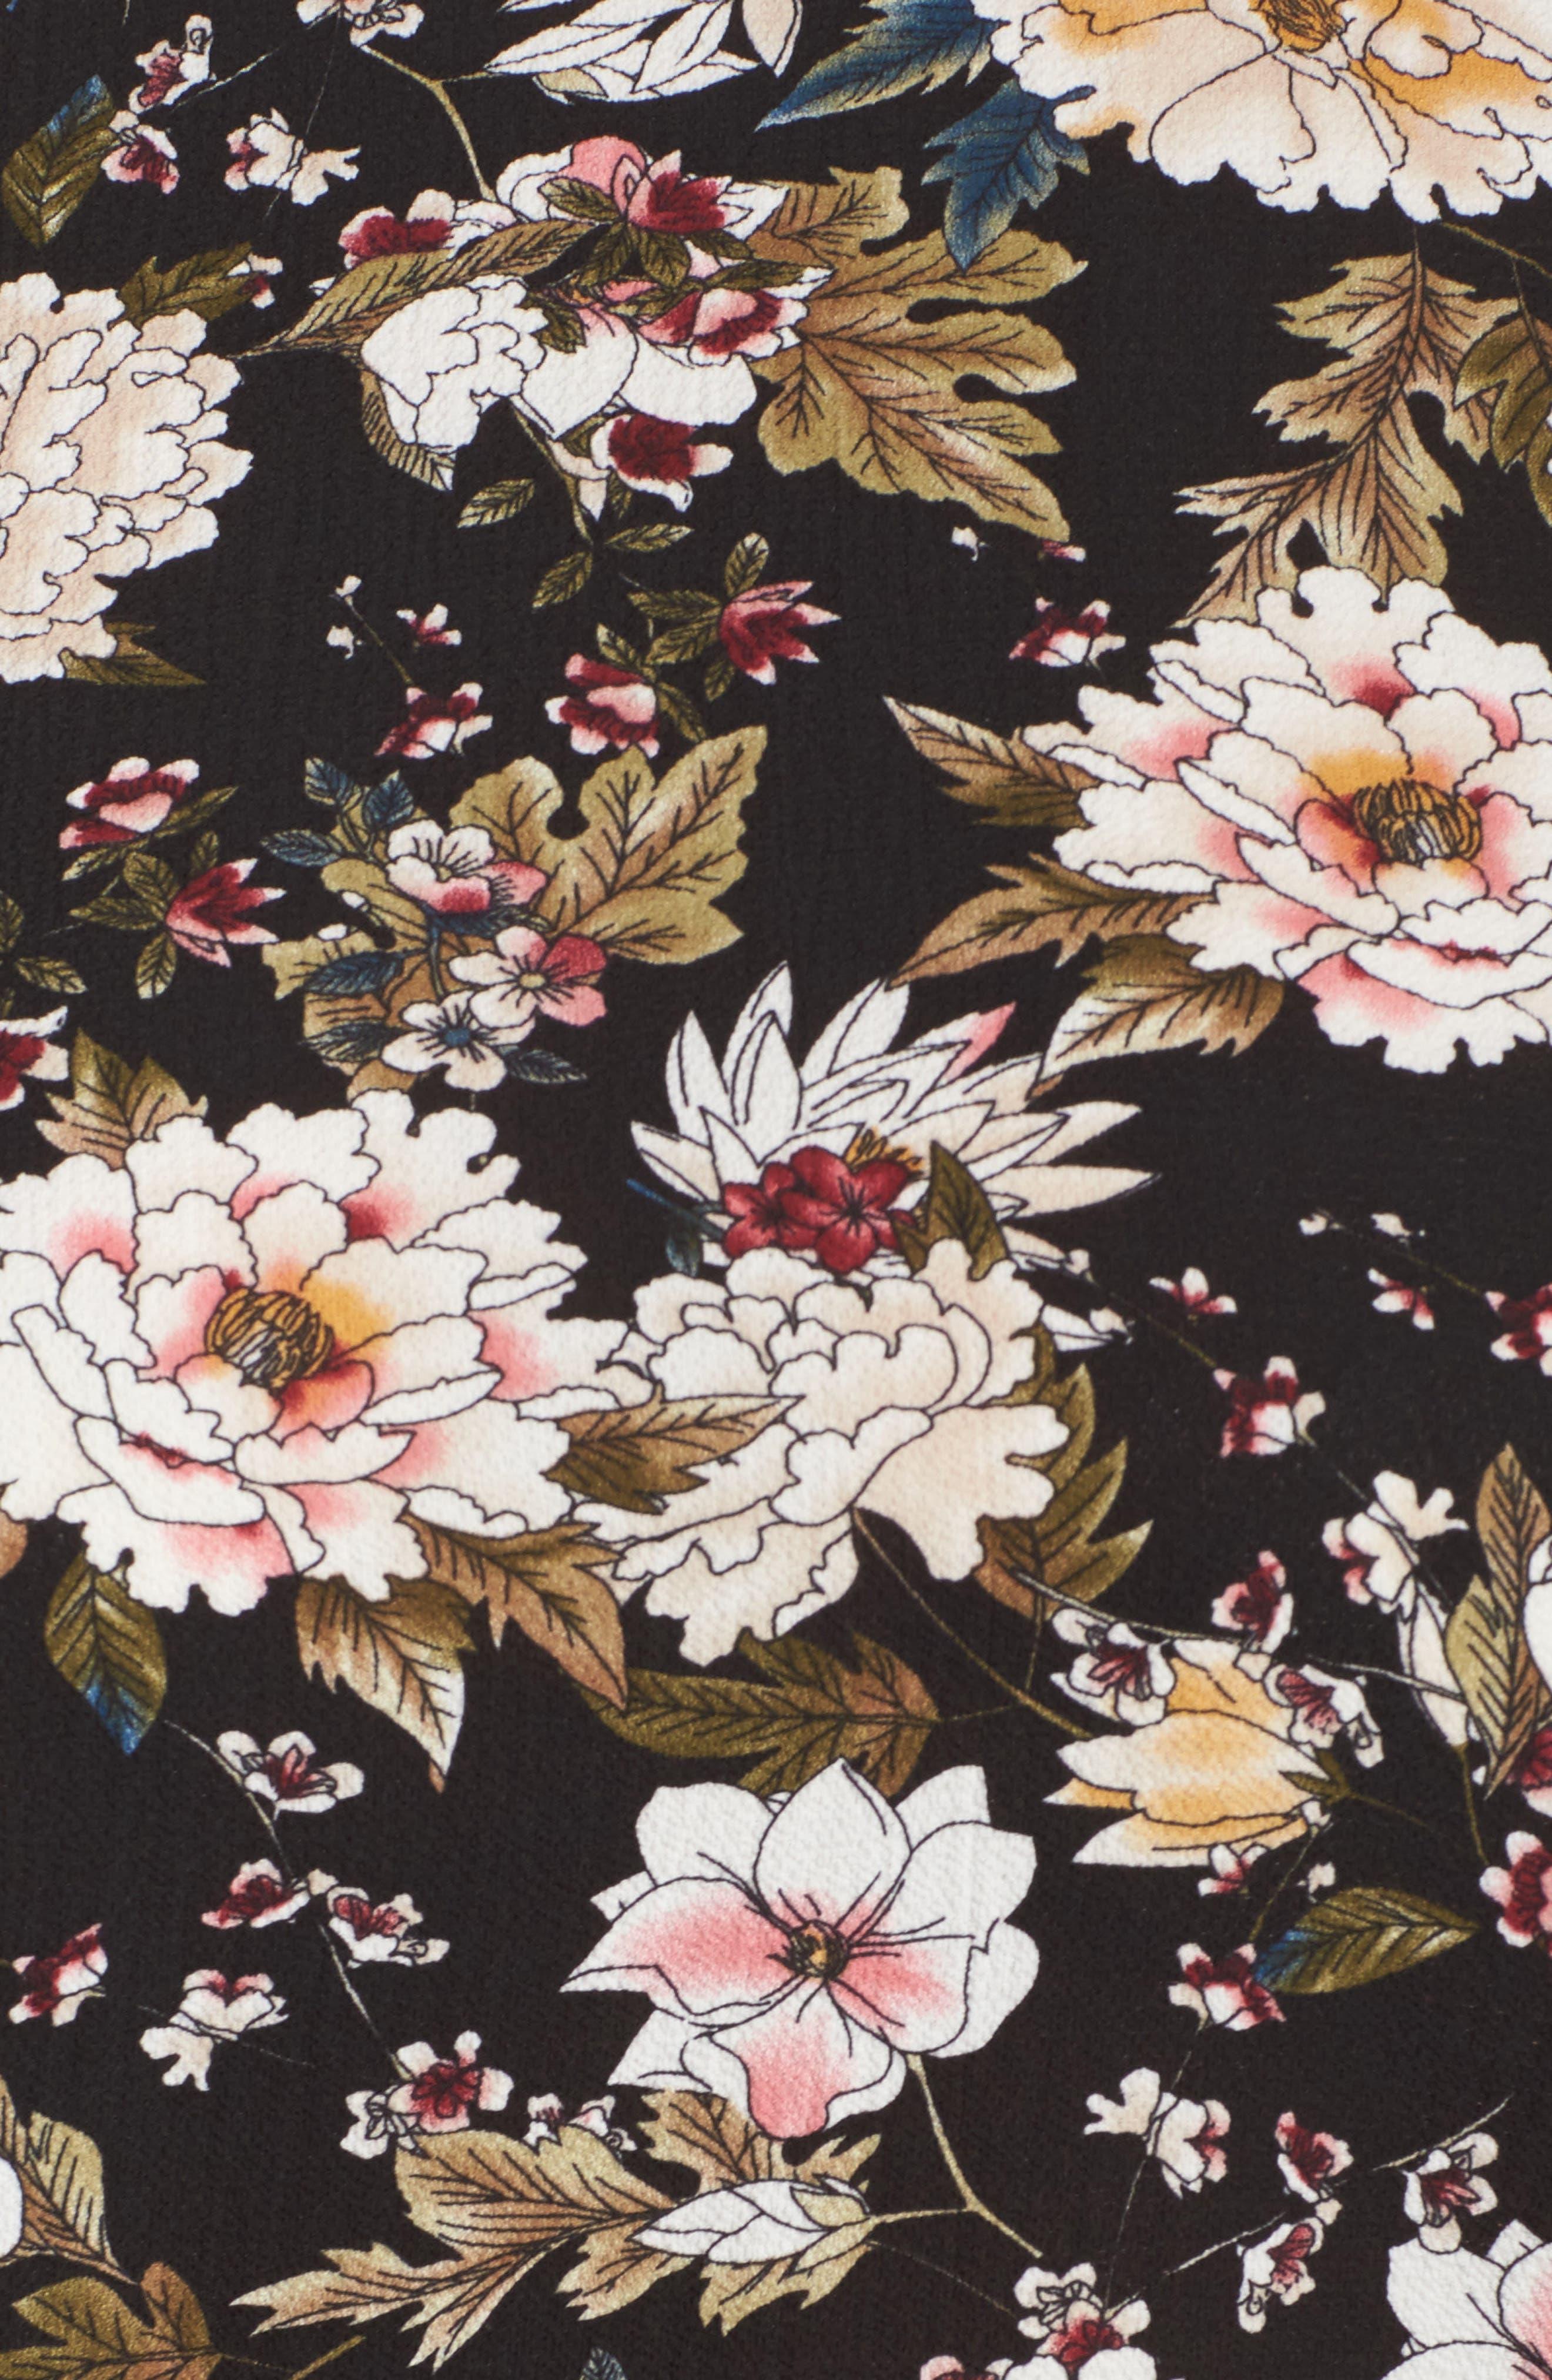 Floral Print Split Sleeve Blouse,                             Alternate thumbnail 5, color,                             006